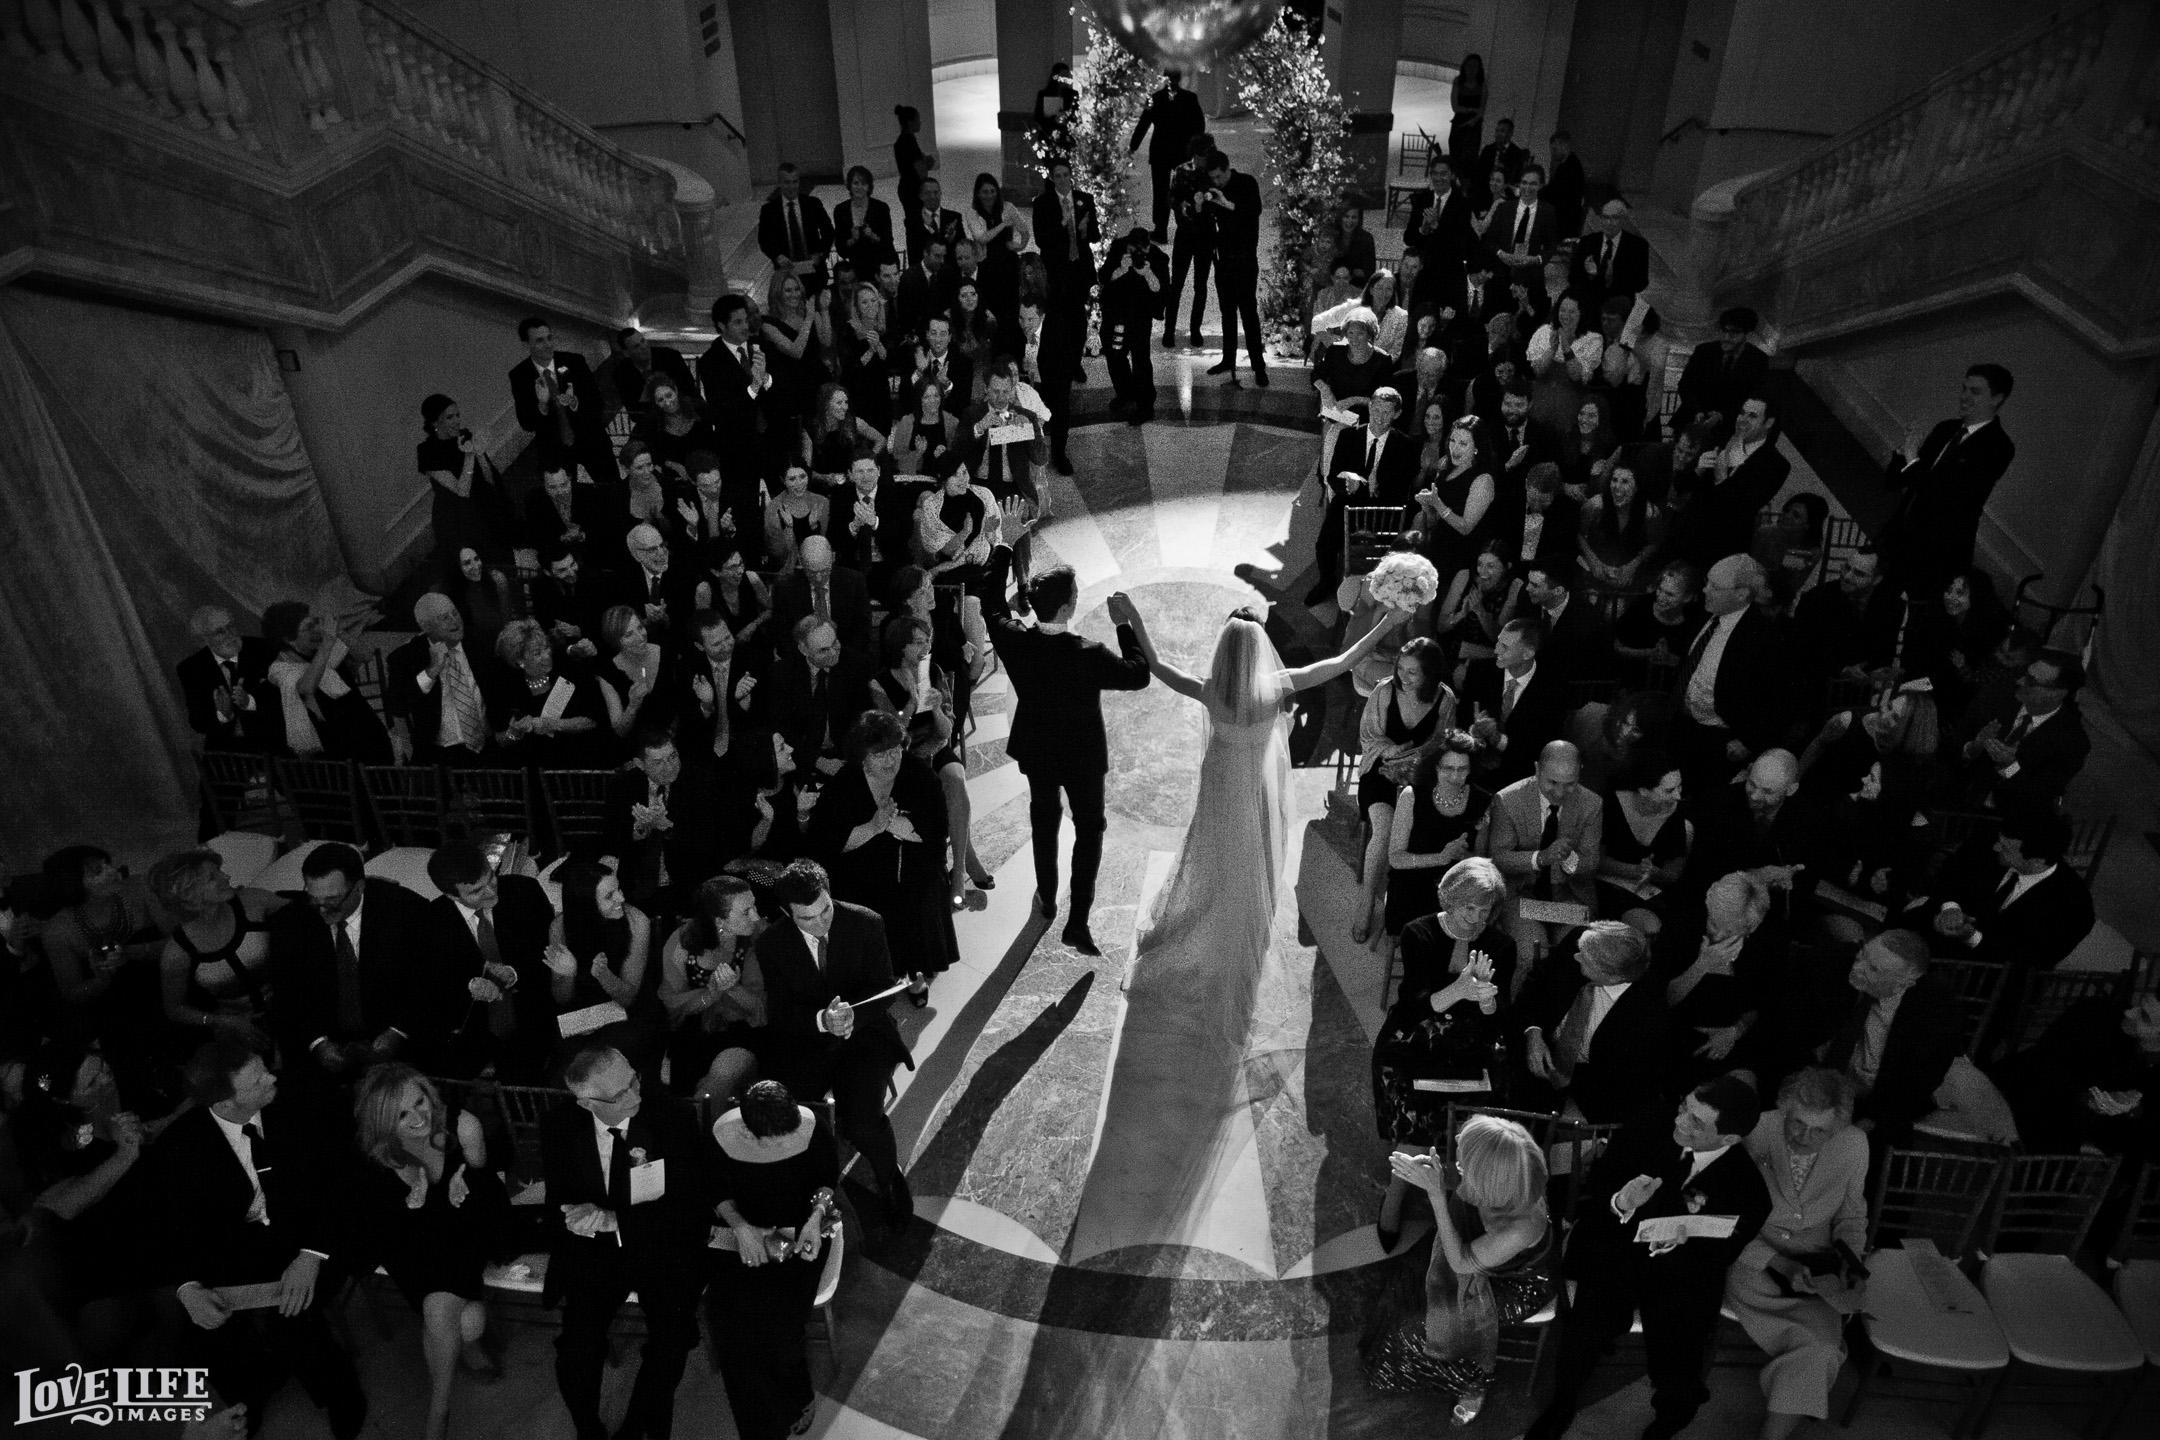 Elisha_Maria_Coleman_Love_Life_Images_Wedding Photography0015A.JPG